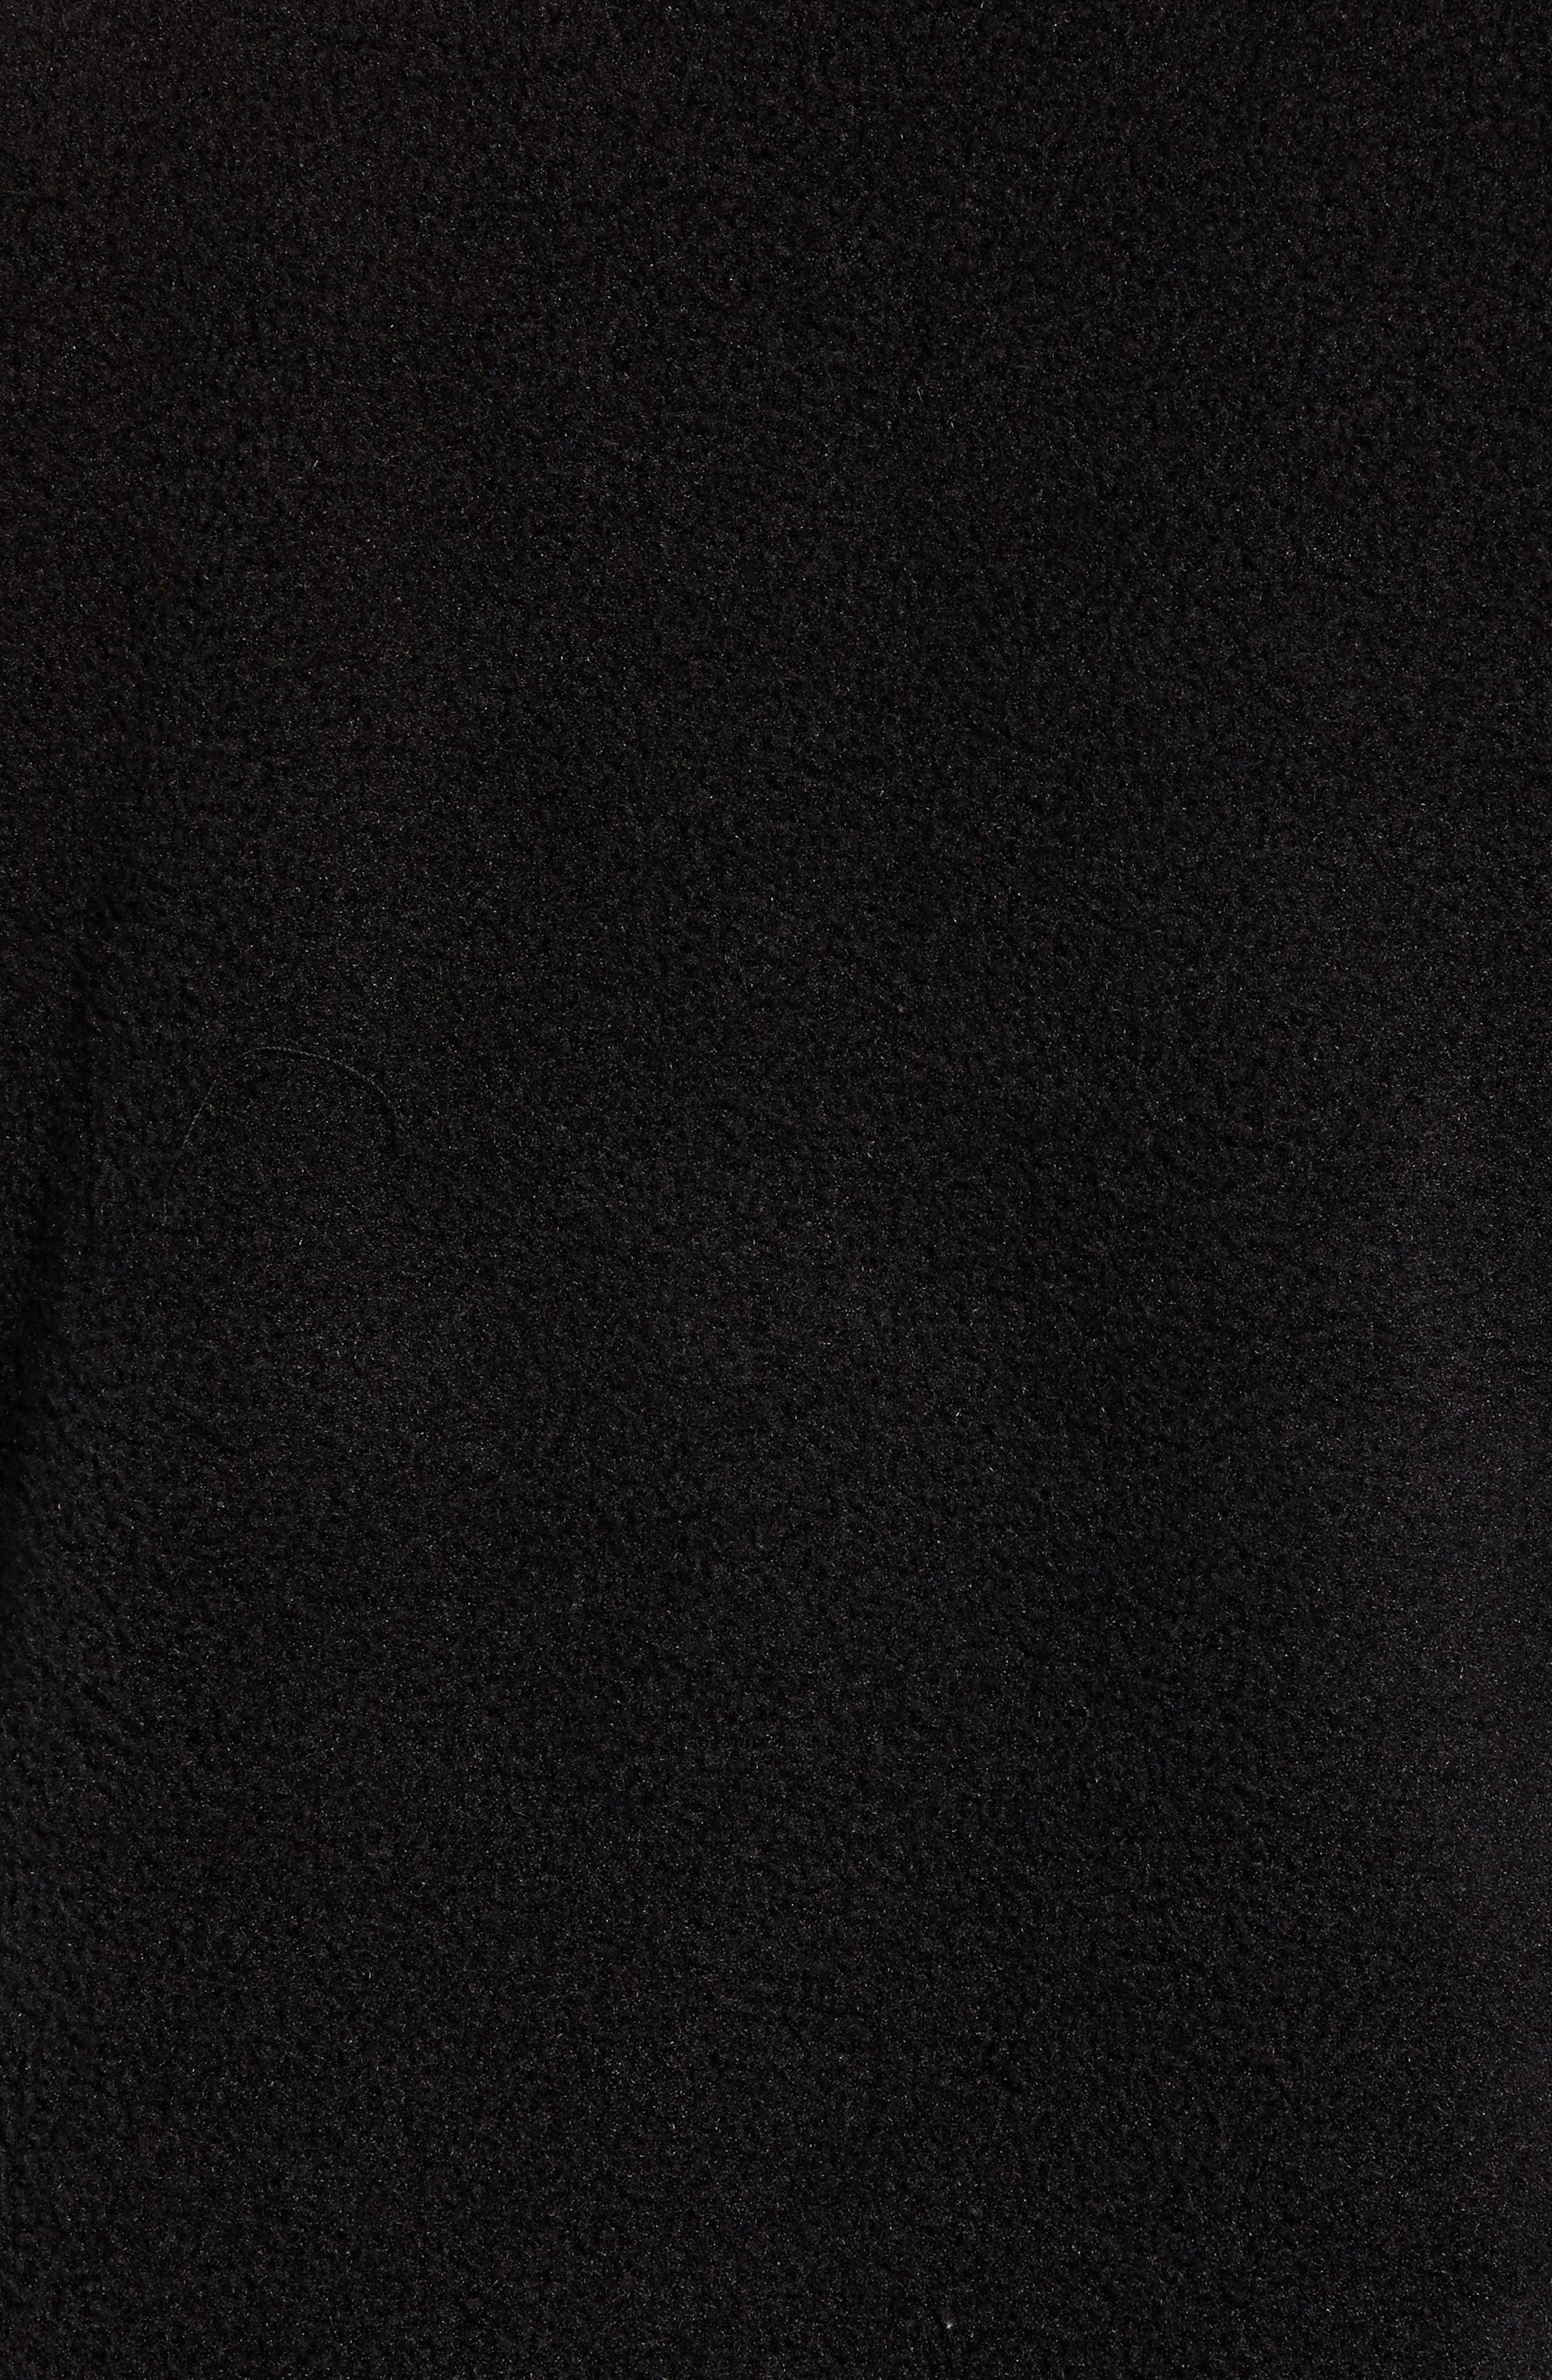 THE NORTH FACE, Tolmiepeak Hybrid Half-Zip Pullover, Alternate thumbnail 6, color, 001